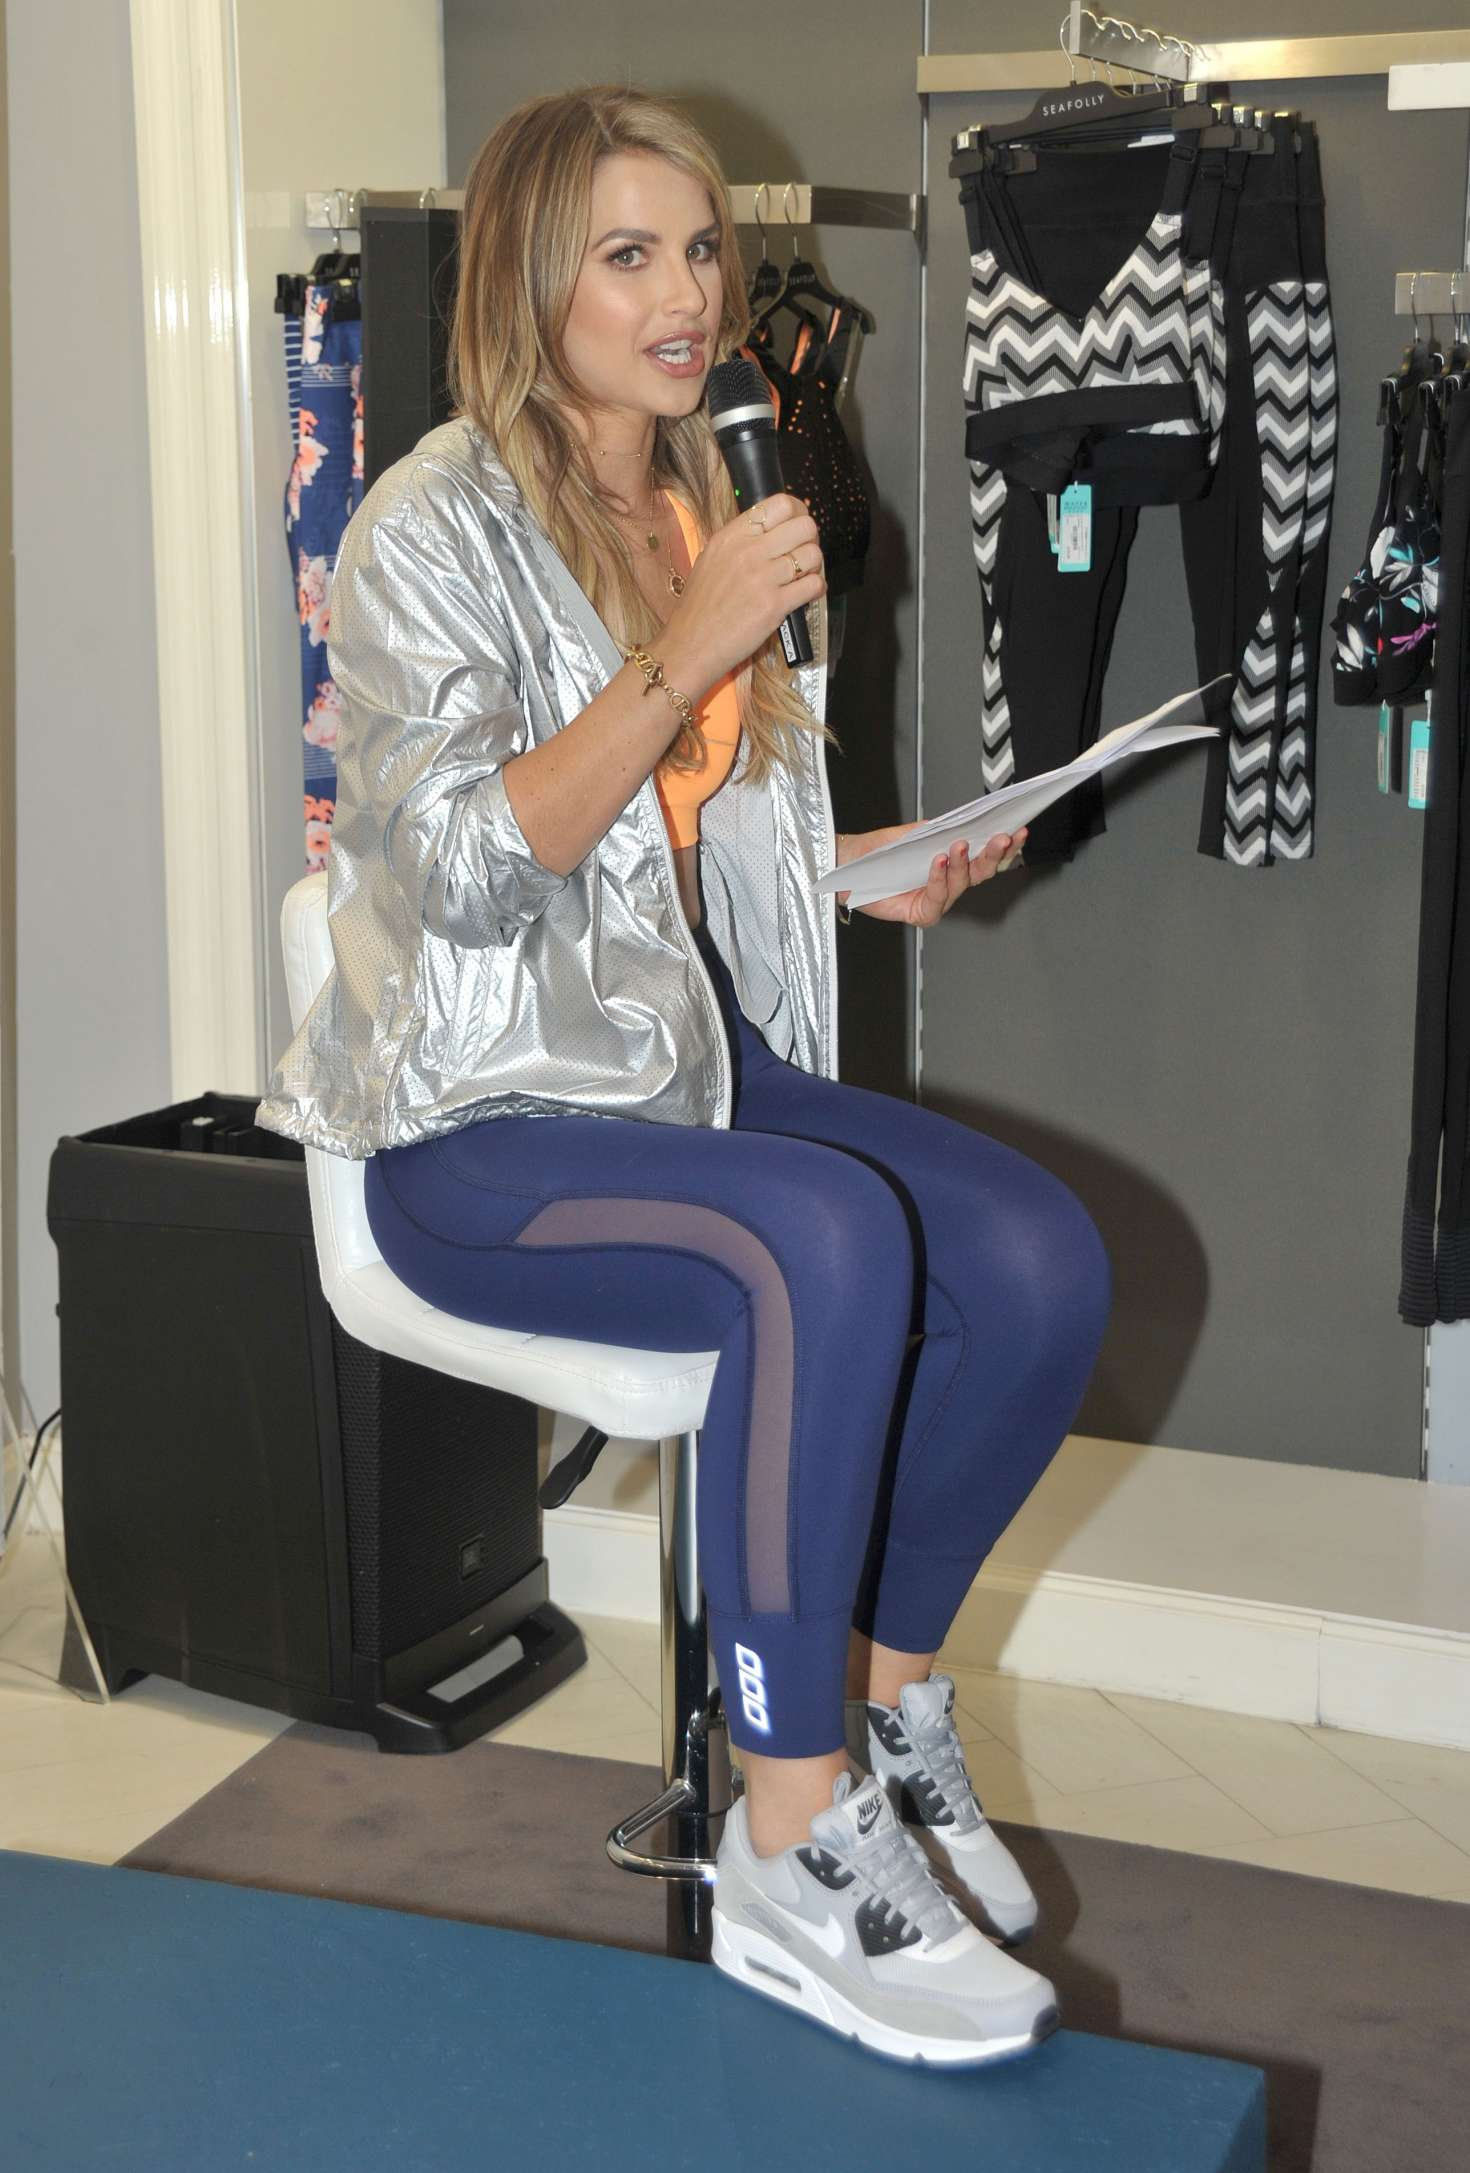 Vogue Williams 2017 : Vogue Williams at Arnotts Department Store -06